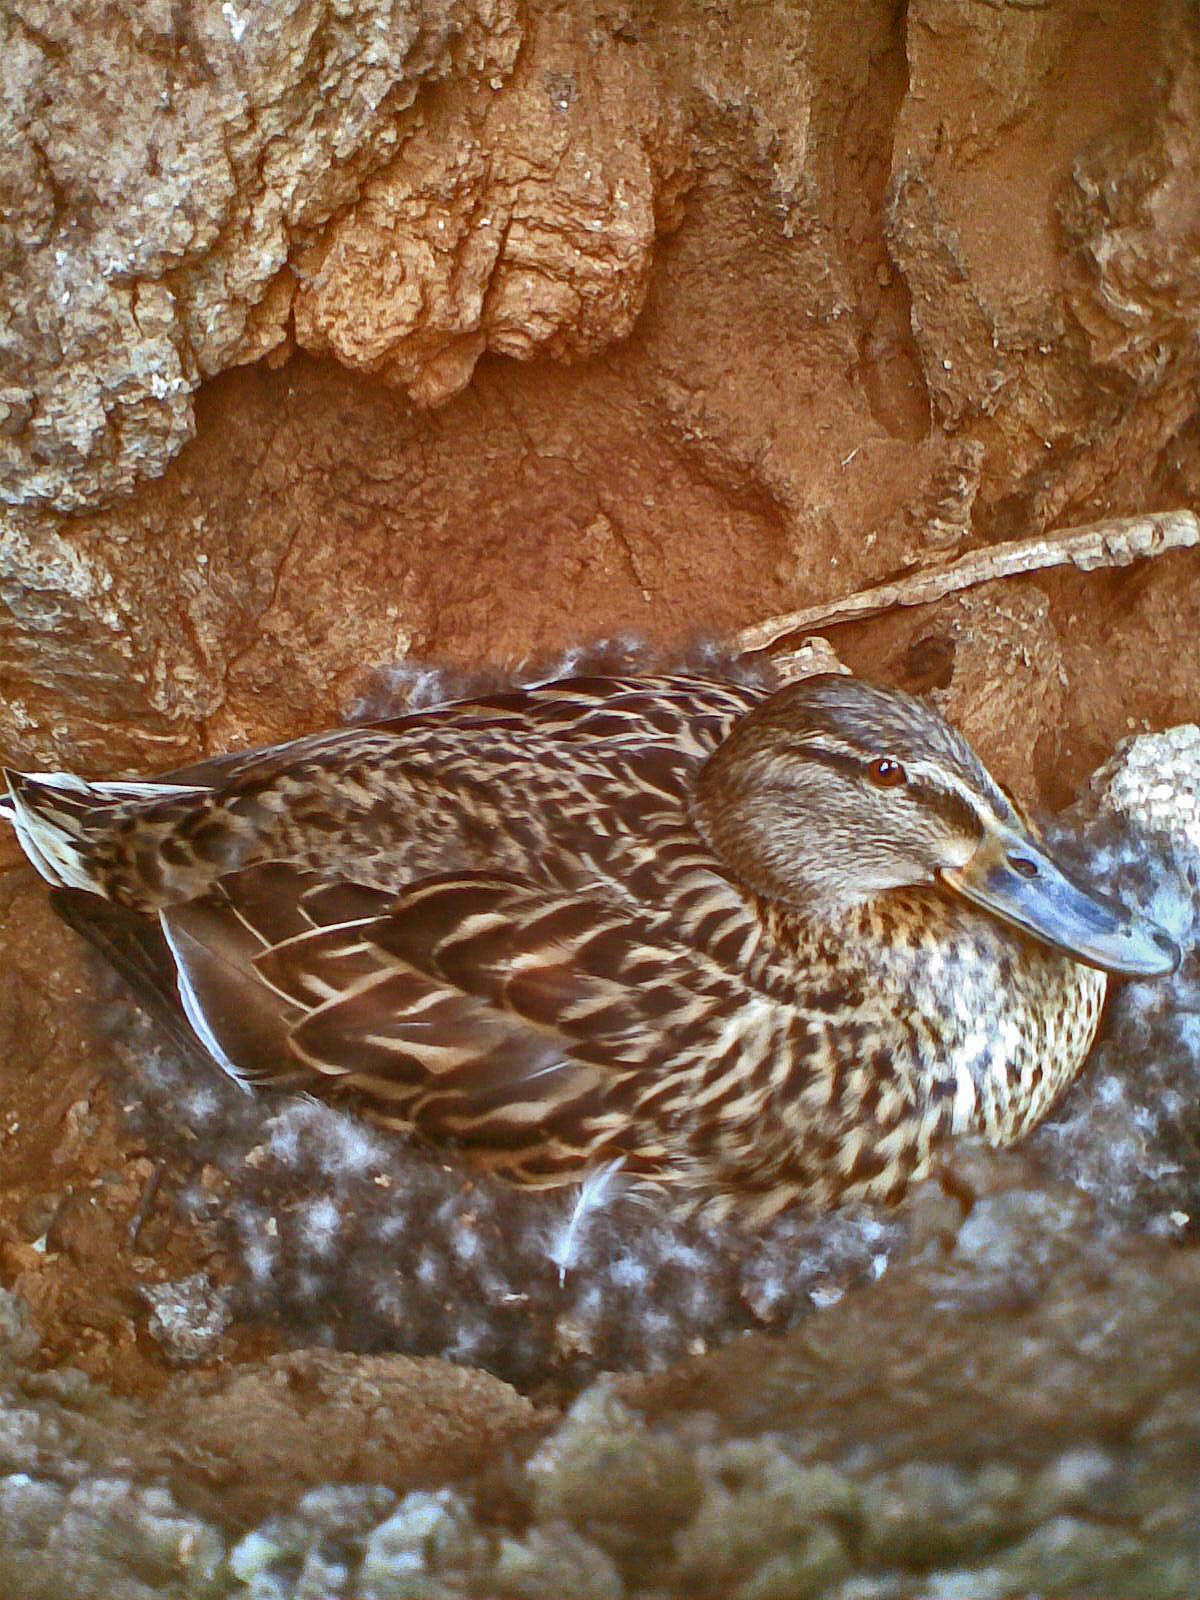 A female Rouen duck incubates her eggs